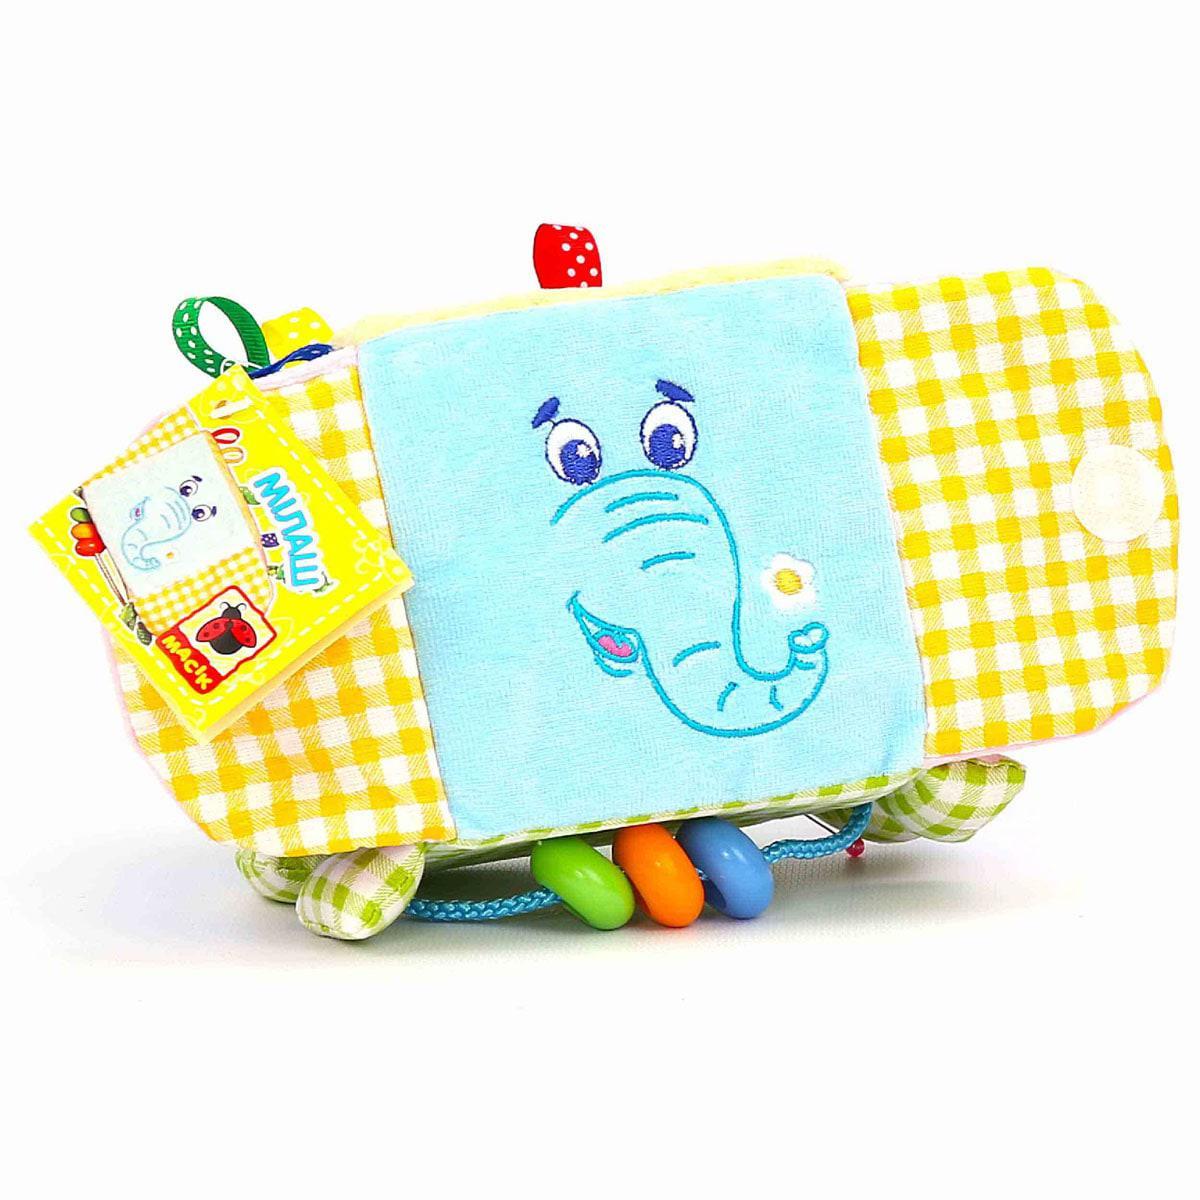 Кубик — Подвеска «Зоопарк» Слон Милаш (МК 5101-03)  Масик